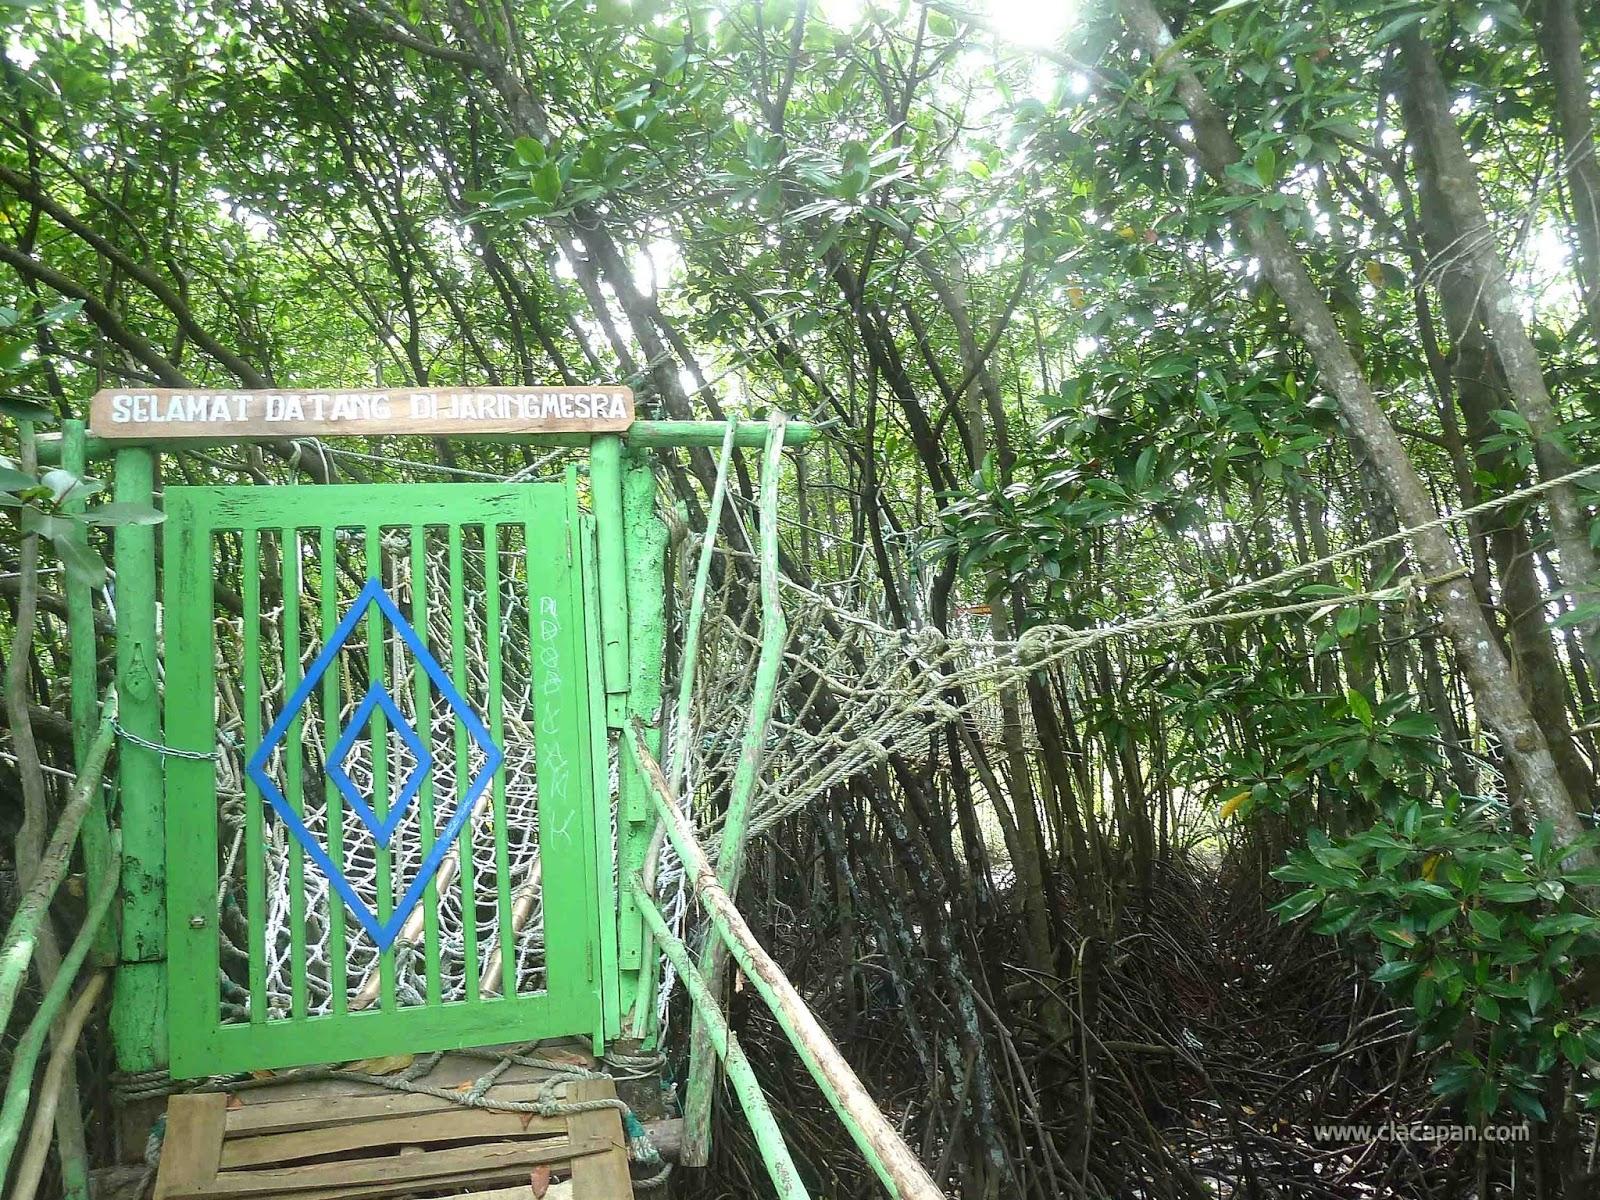 Wisata Hutan Payau Keindahannya Hampir Terlupakan Yuk Wahana Jaring Mesra